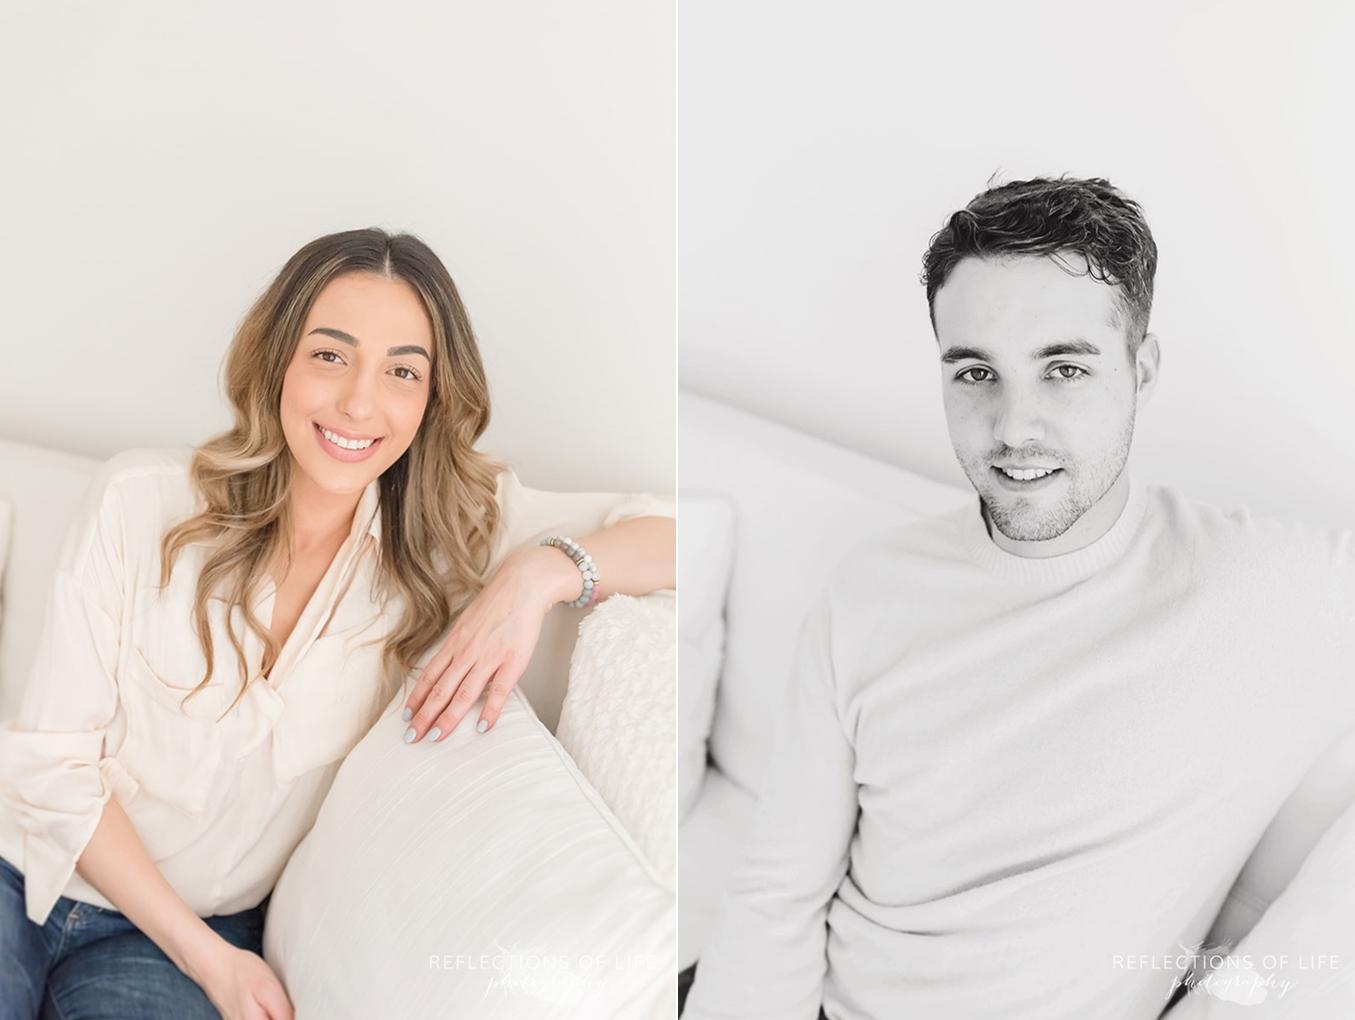 portraits of husband and wife